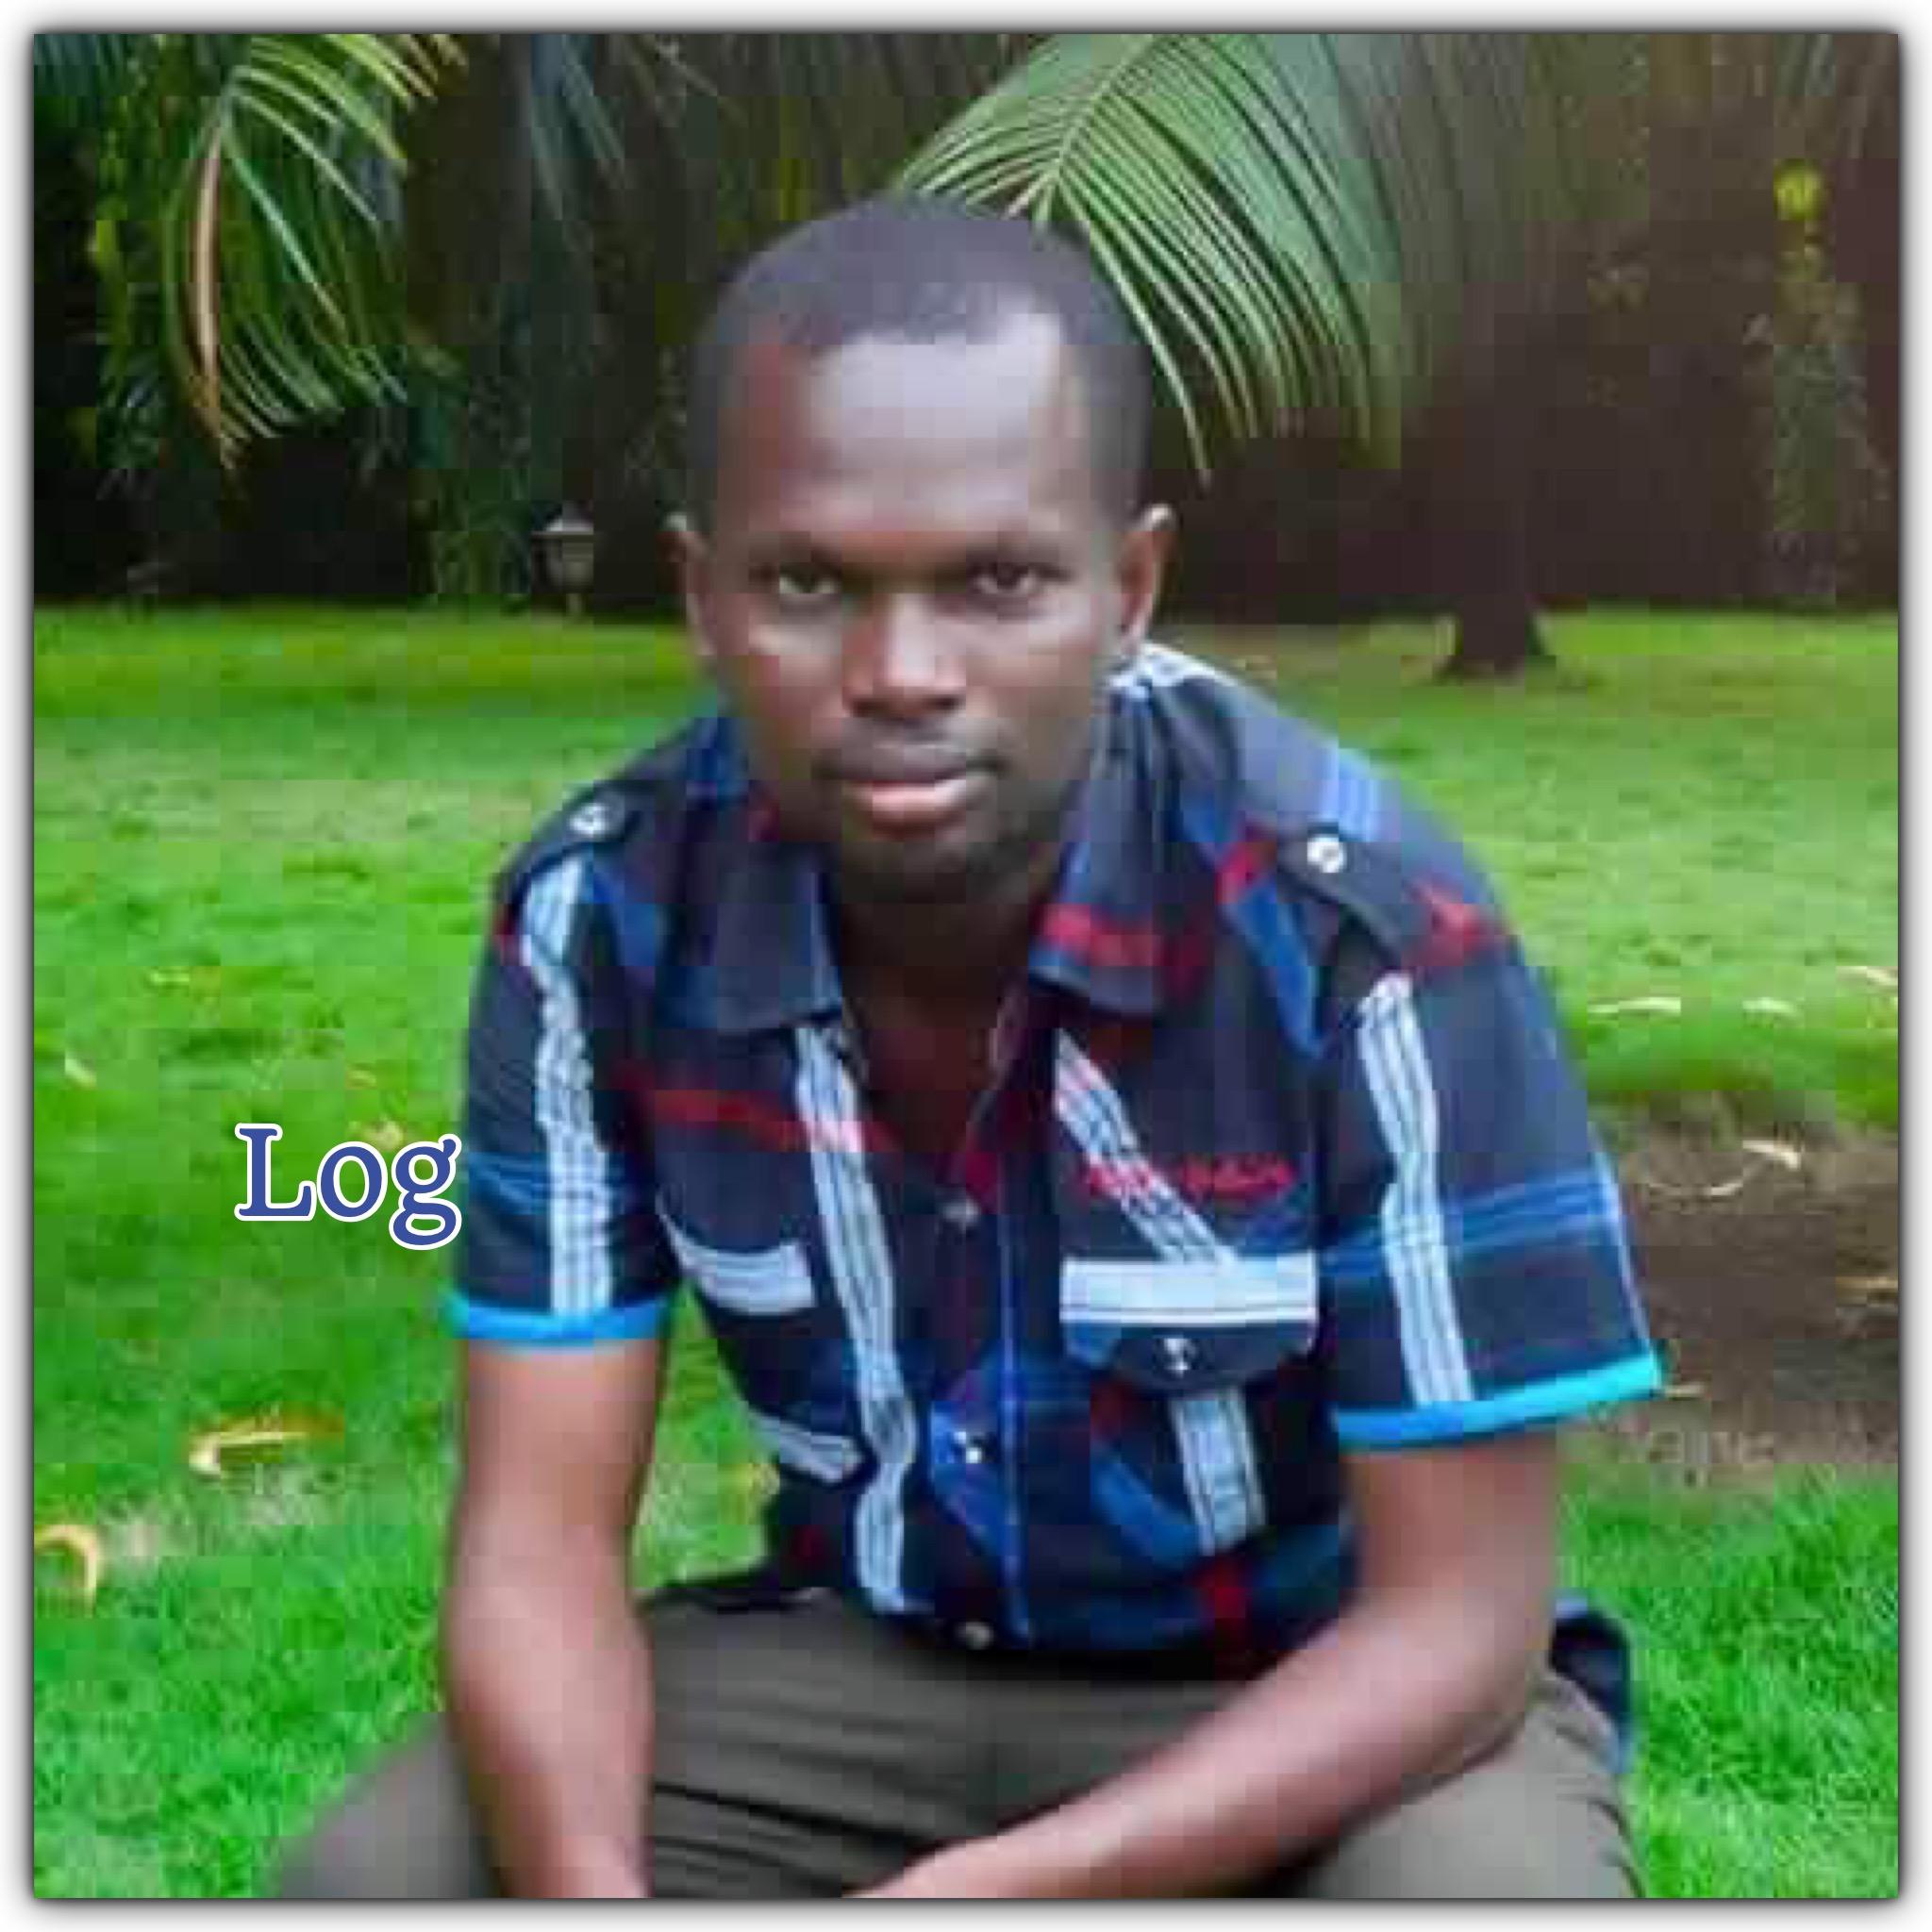 Mohamed Koula Diallo journaliste tué le 05 février 2016